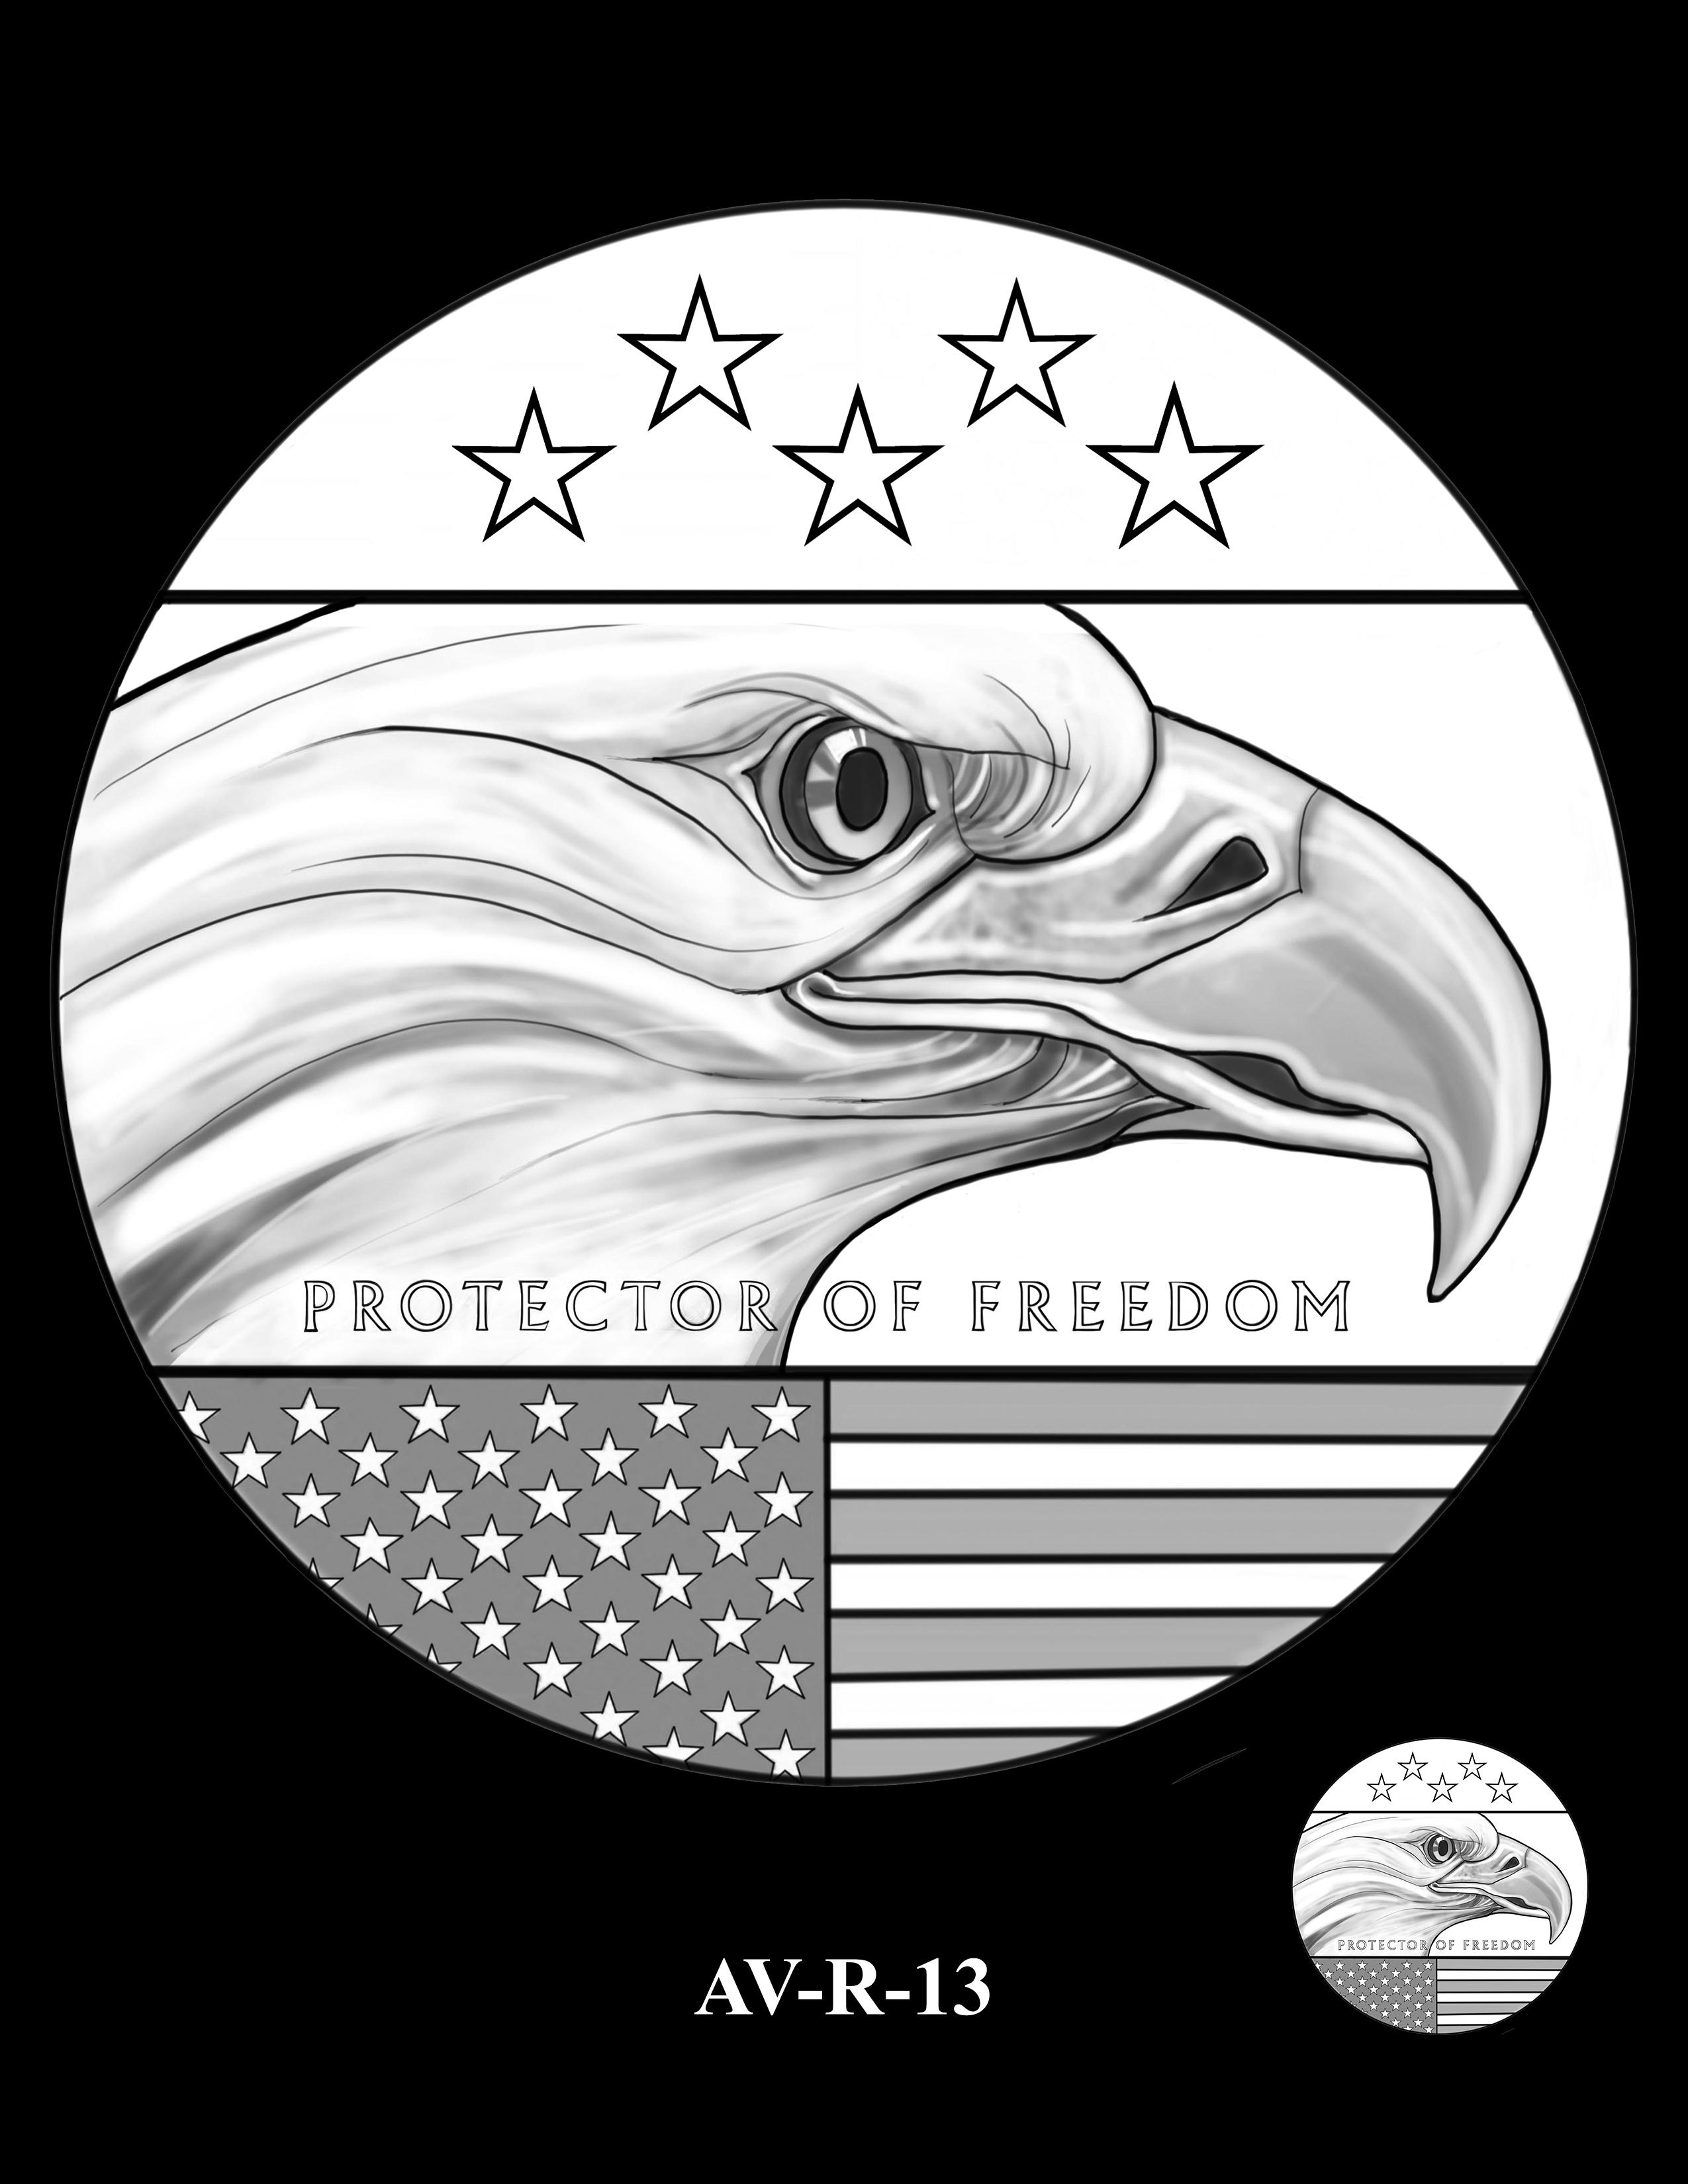 AV-R-13 - American Veterans Medal